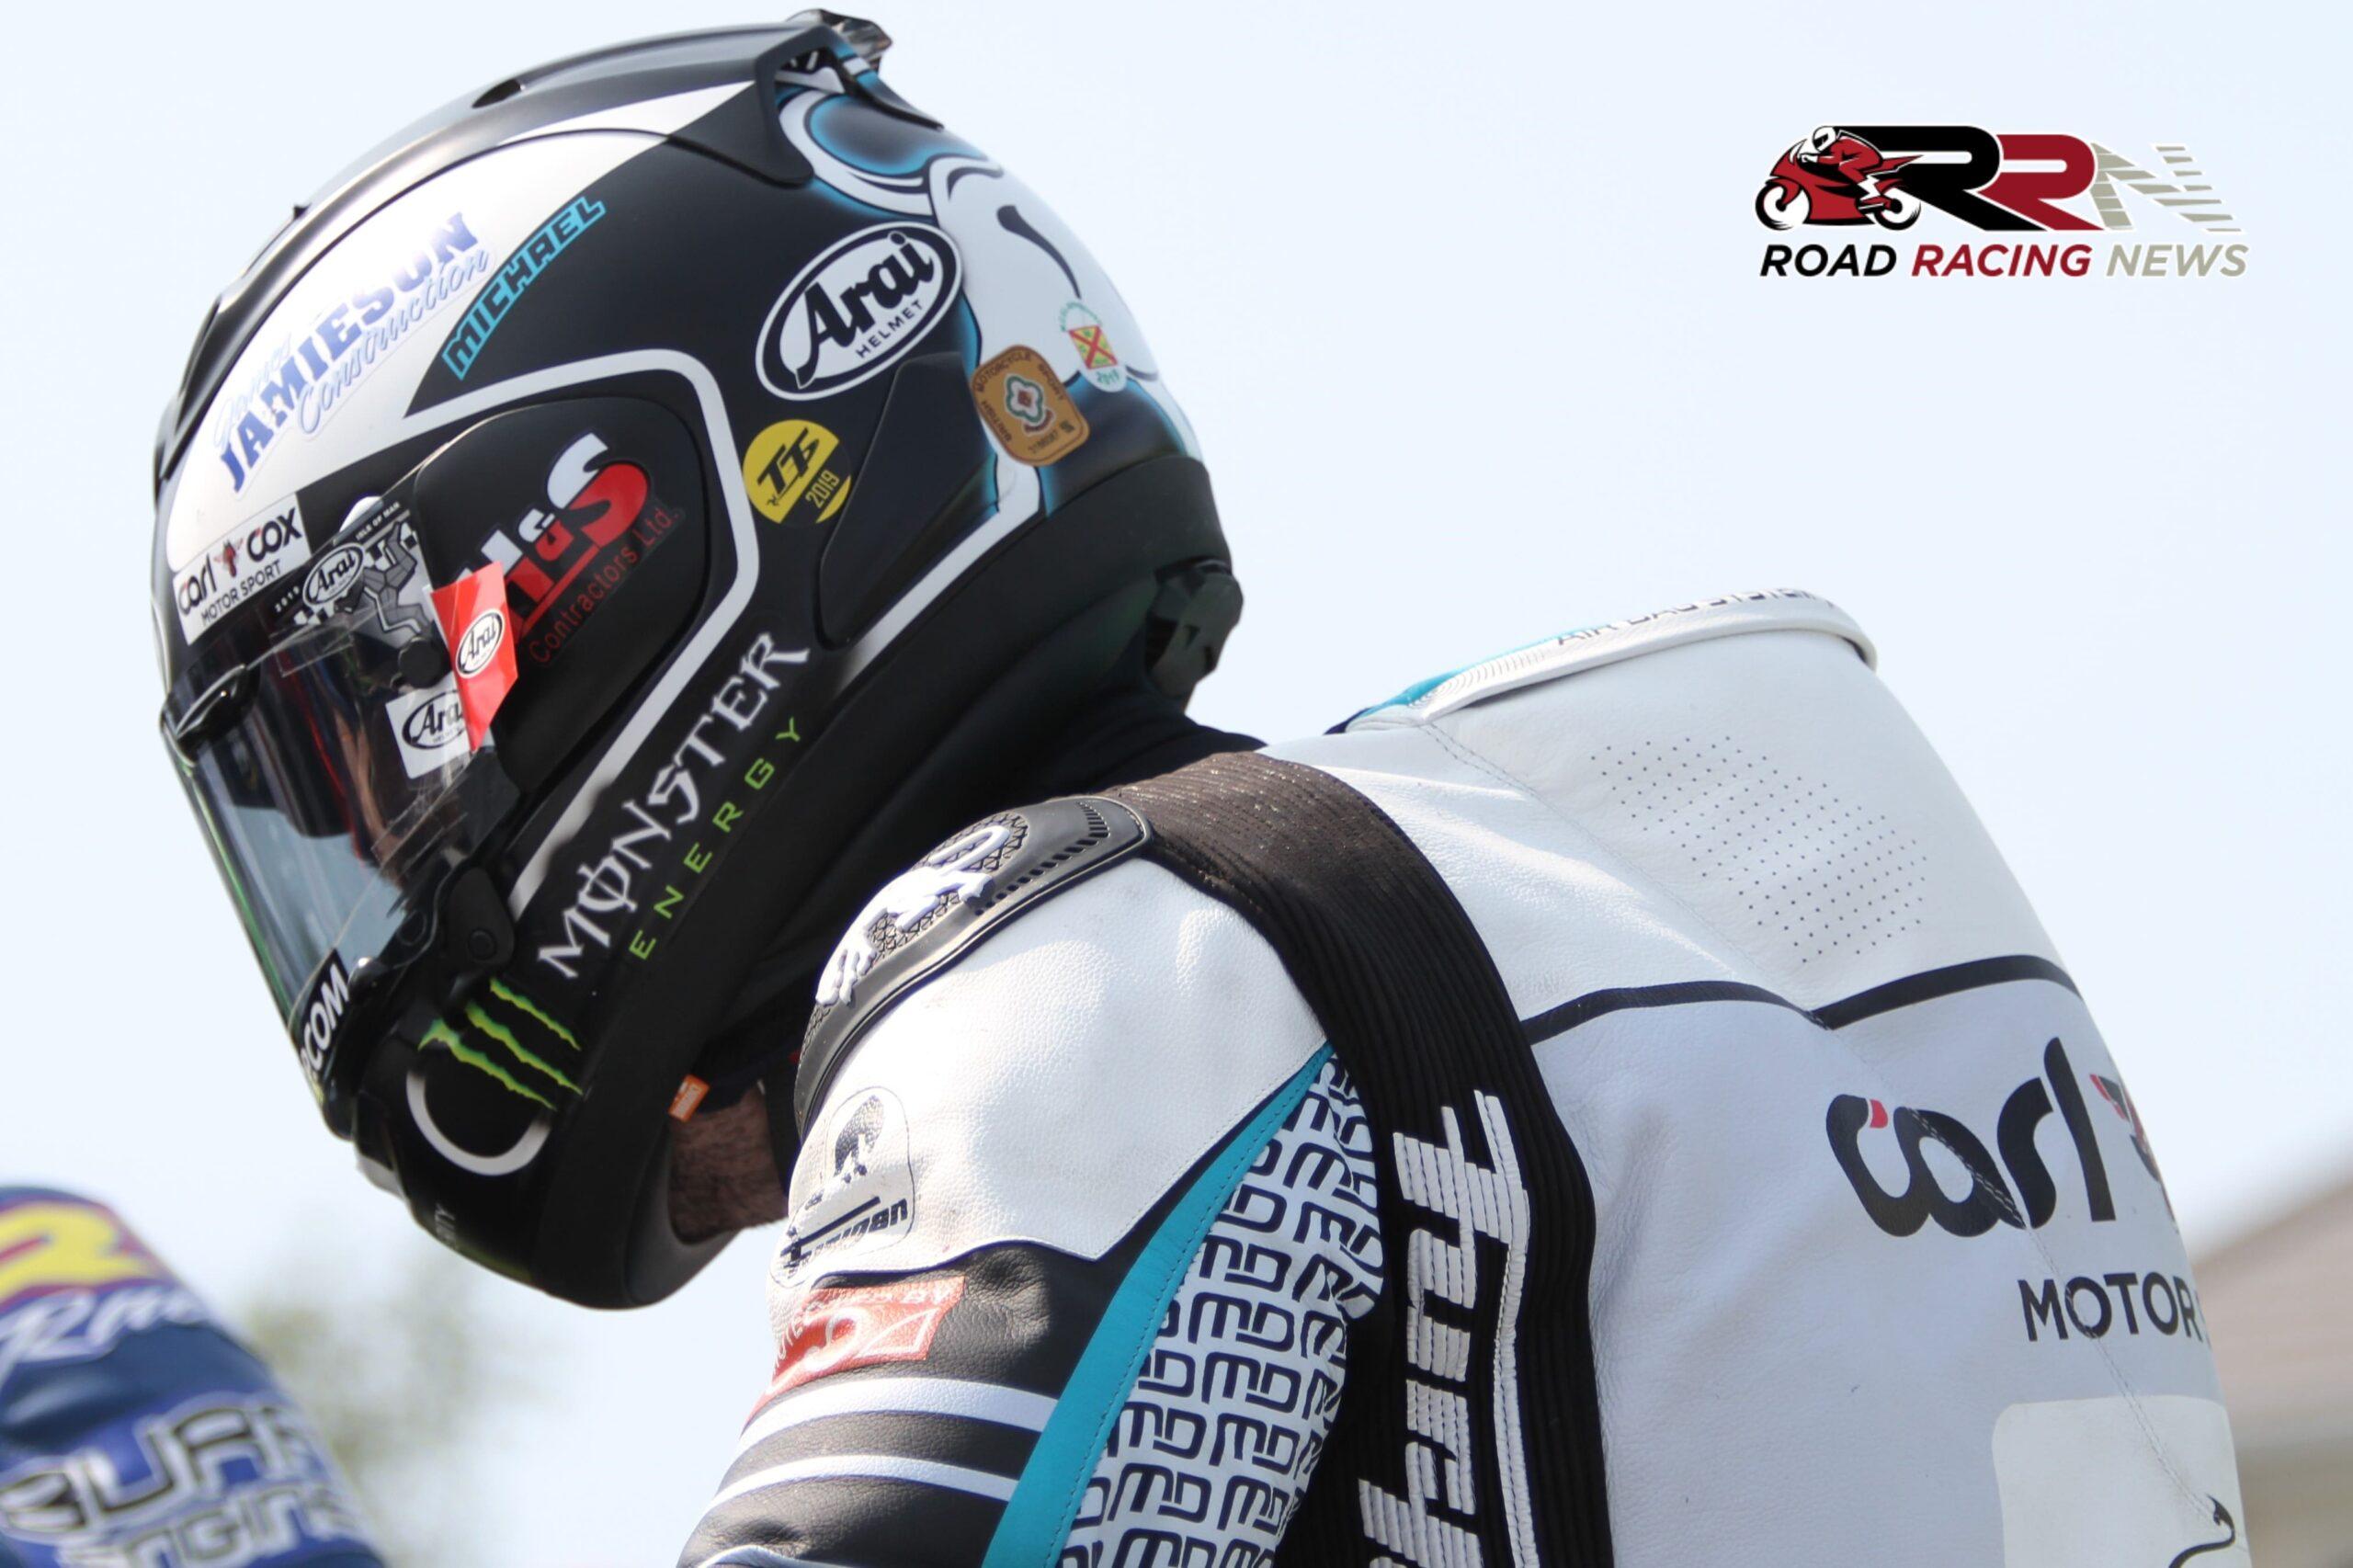 BSB Oulton Park: Positive Start For 19 Times TT Winner Dunlop